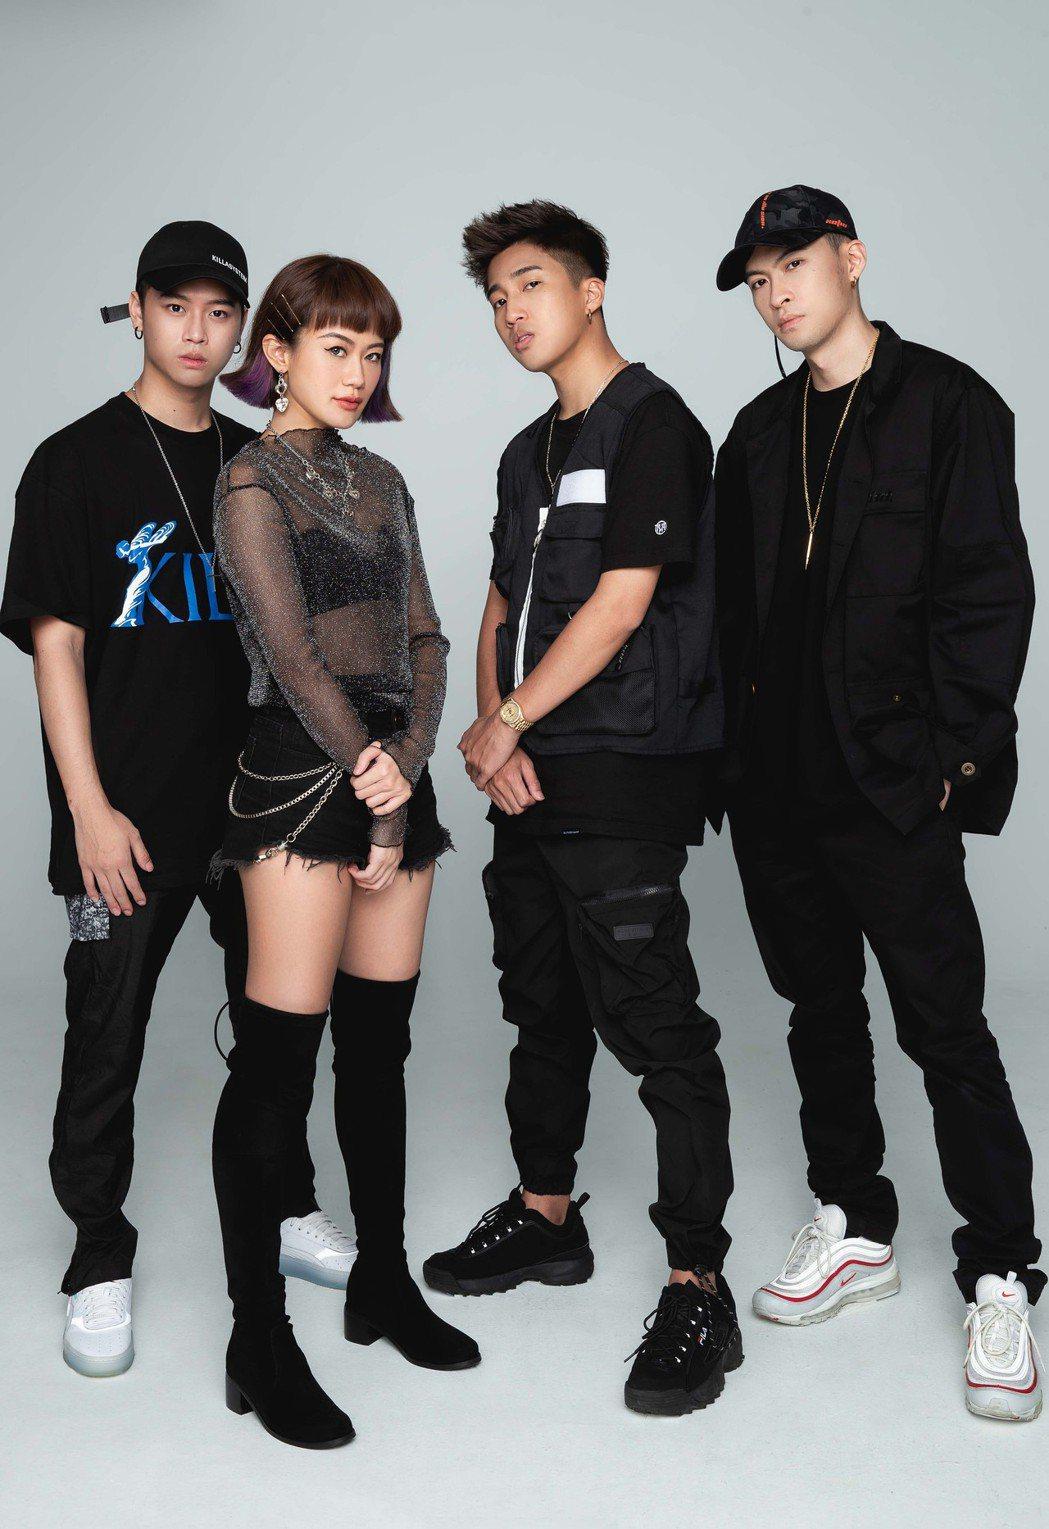 Ching G Squad時隔7個月再聚首演出,首次挑戰VR開唱,團員都喊「co...